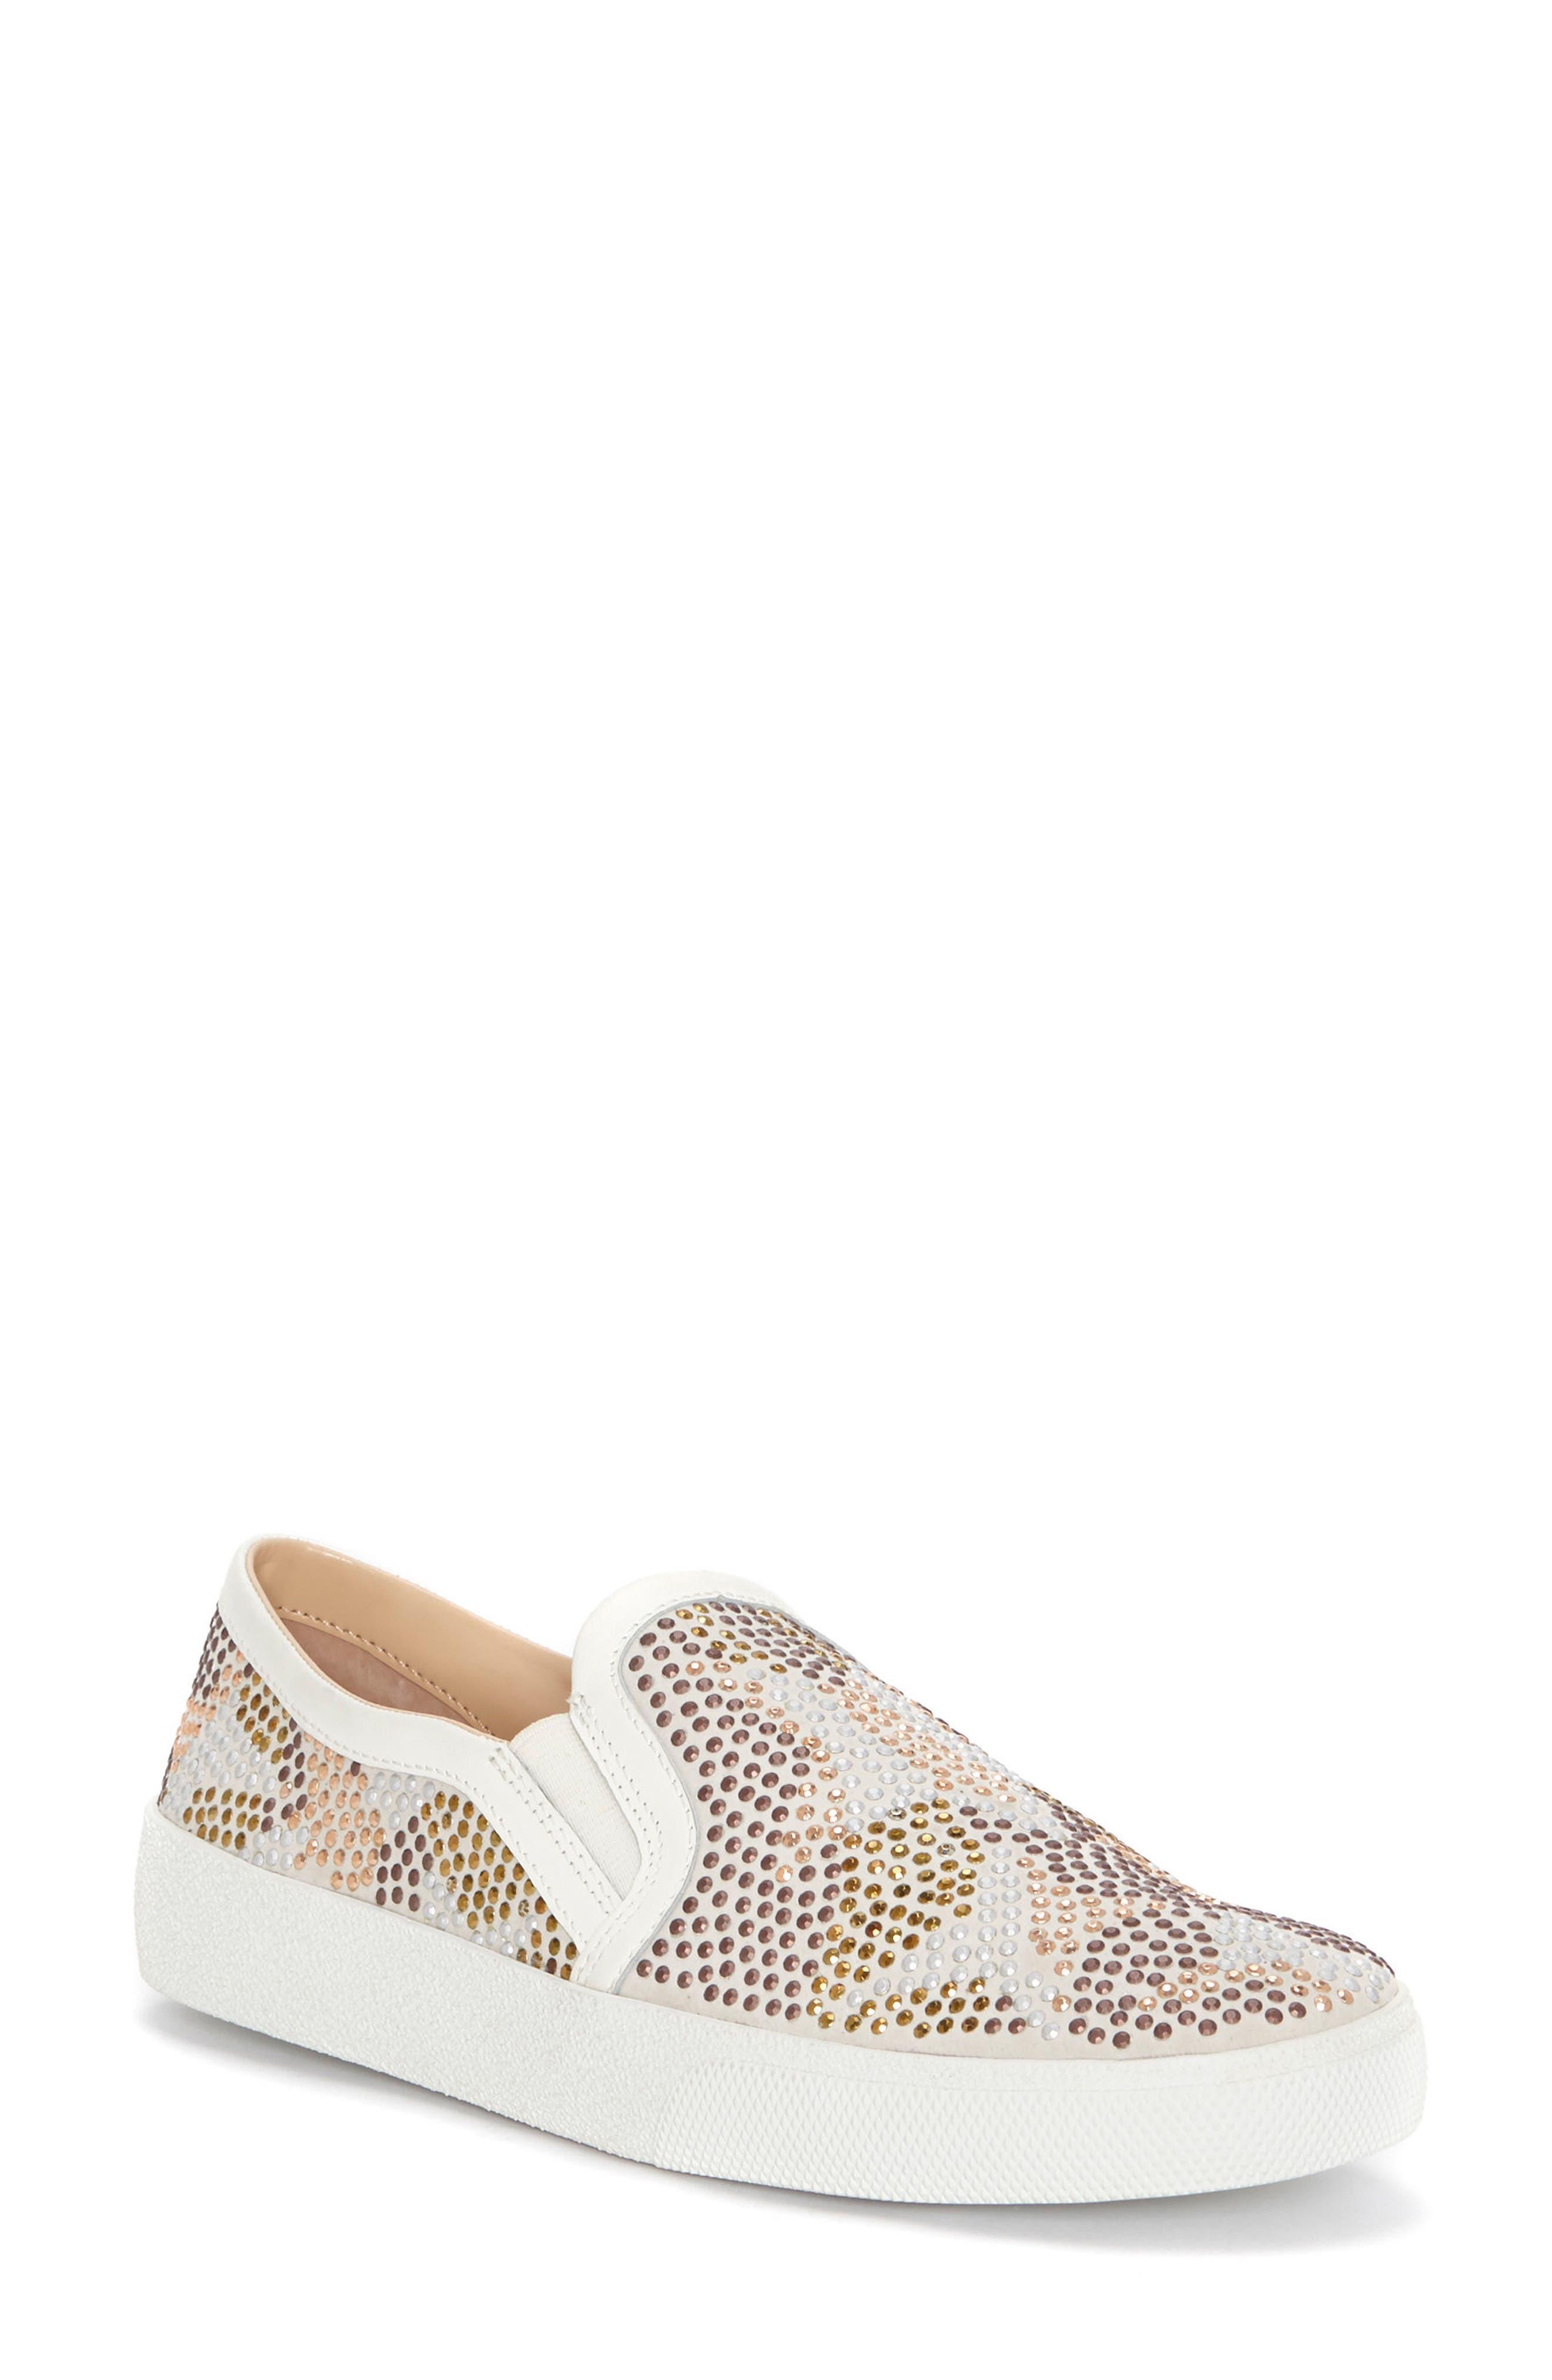 Canita Slip-On Sneaker,                             Main thumbnail 3, color,